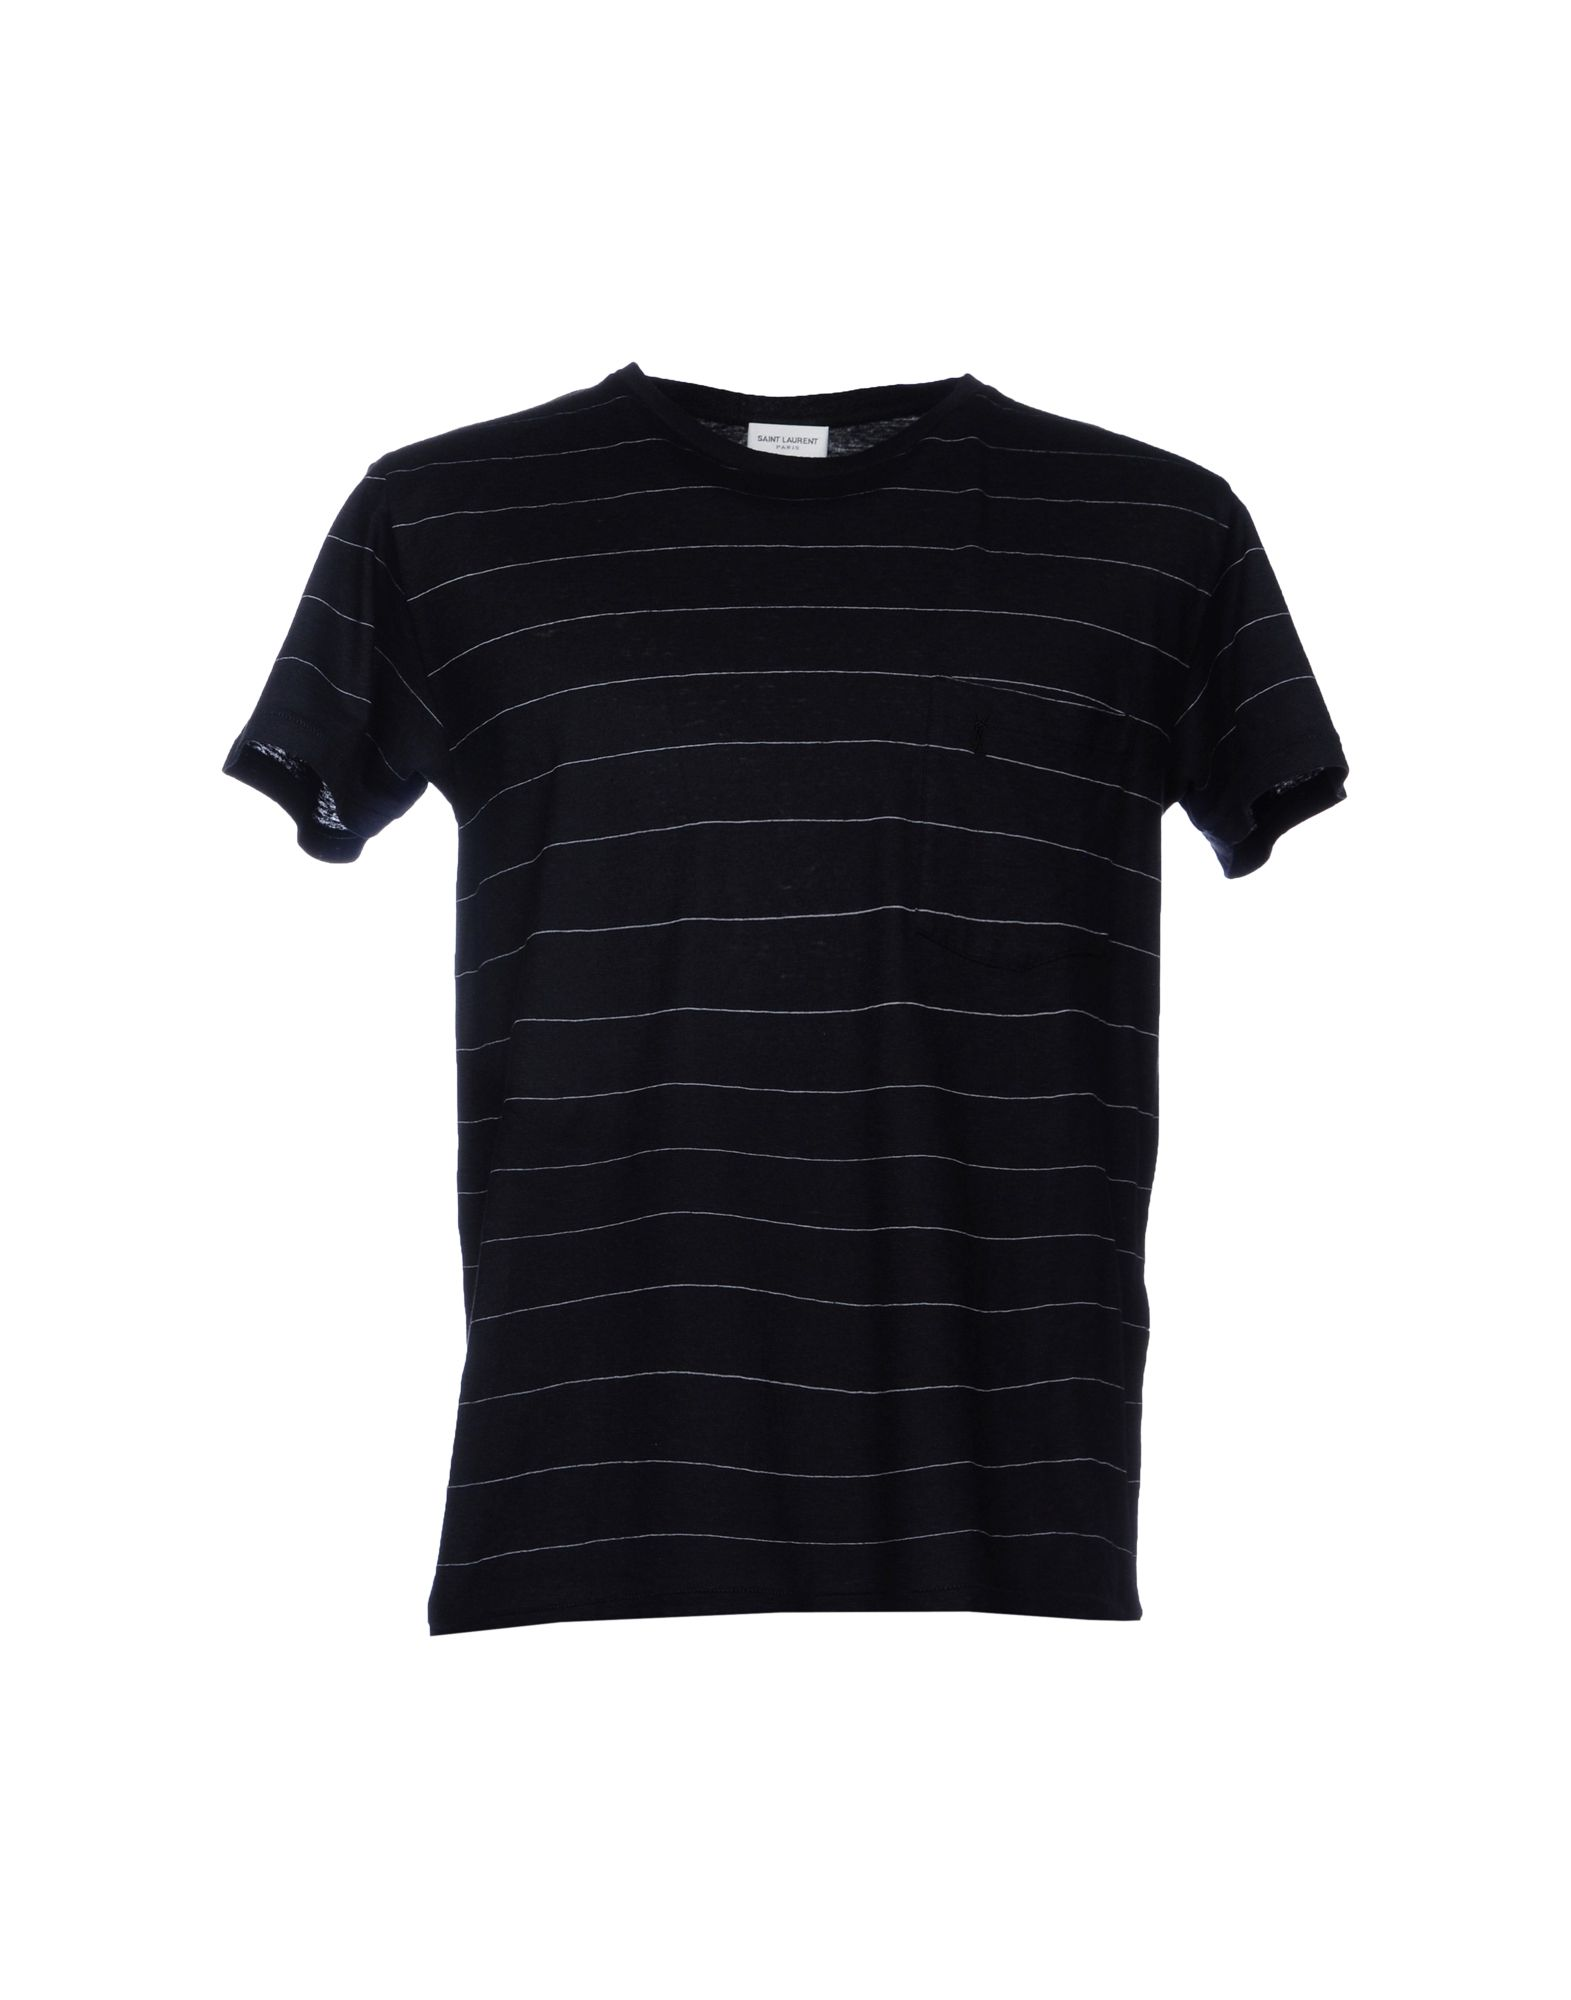 T-Shirt Saint Laurent Uomo - Acquista online su